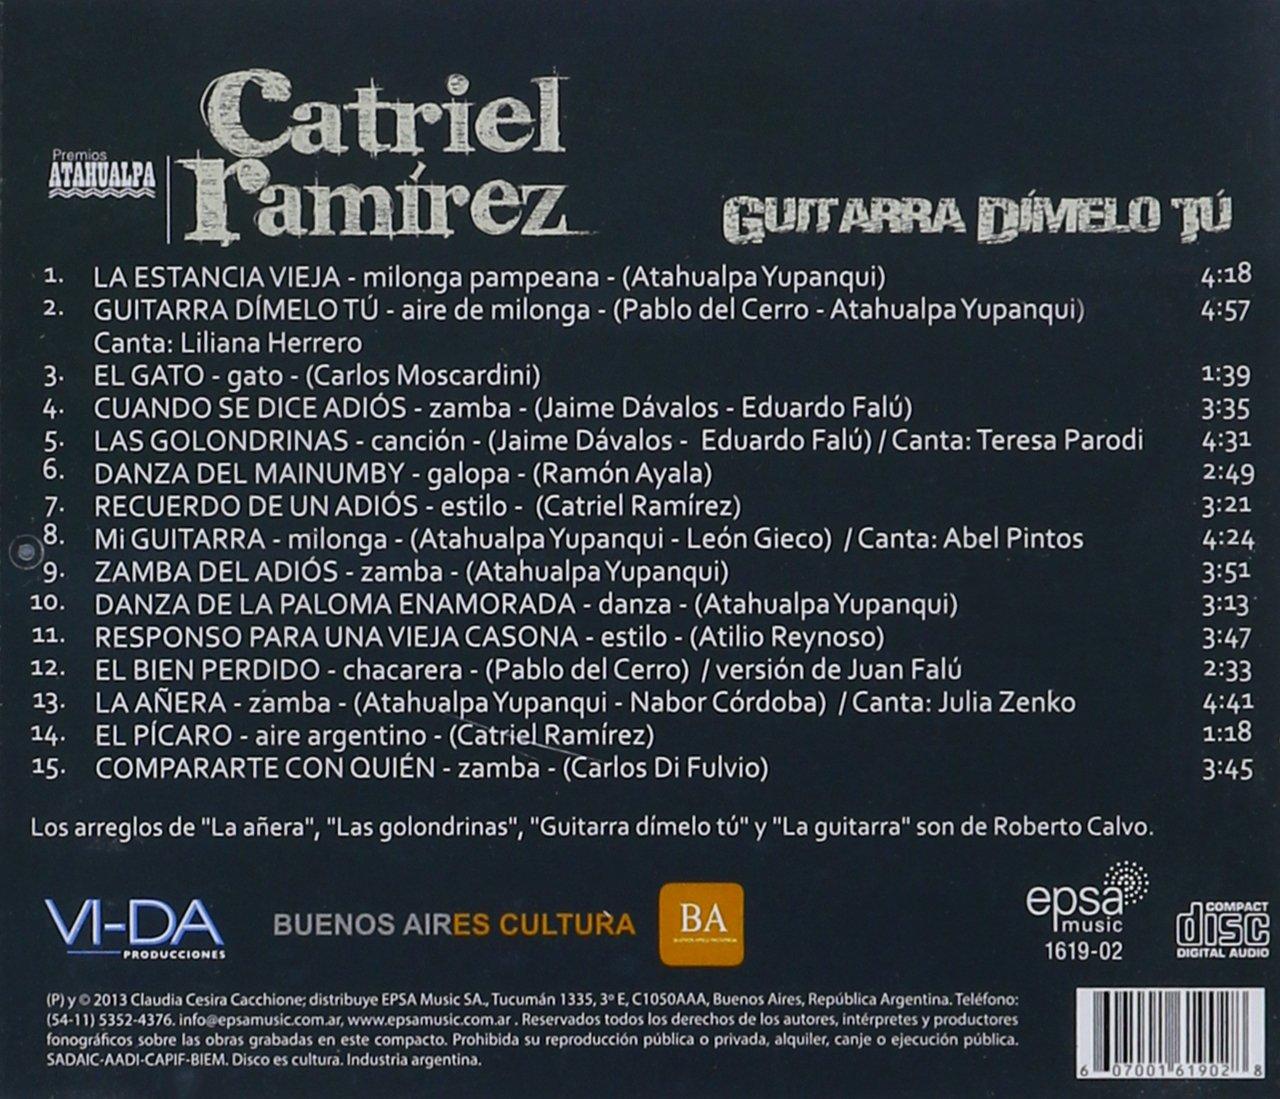 Guitarra Dimelo Tu: Catriel Ramirez: Amazon.es: Música